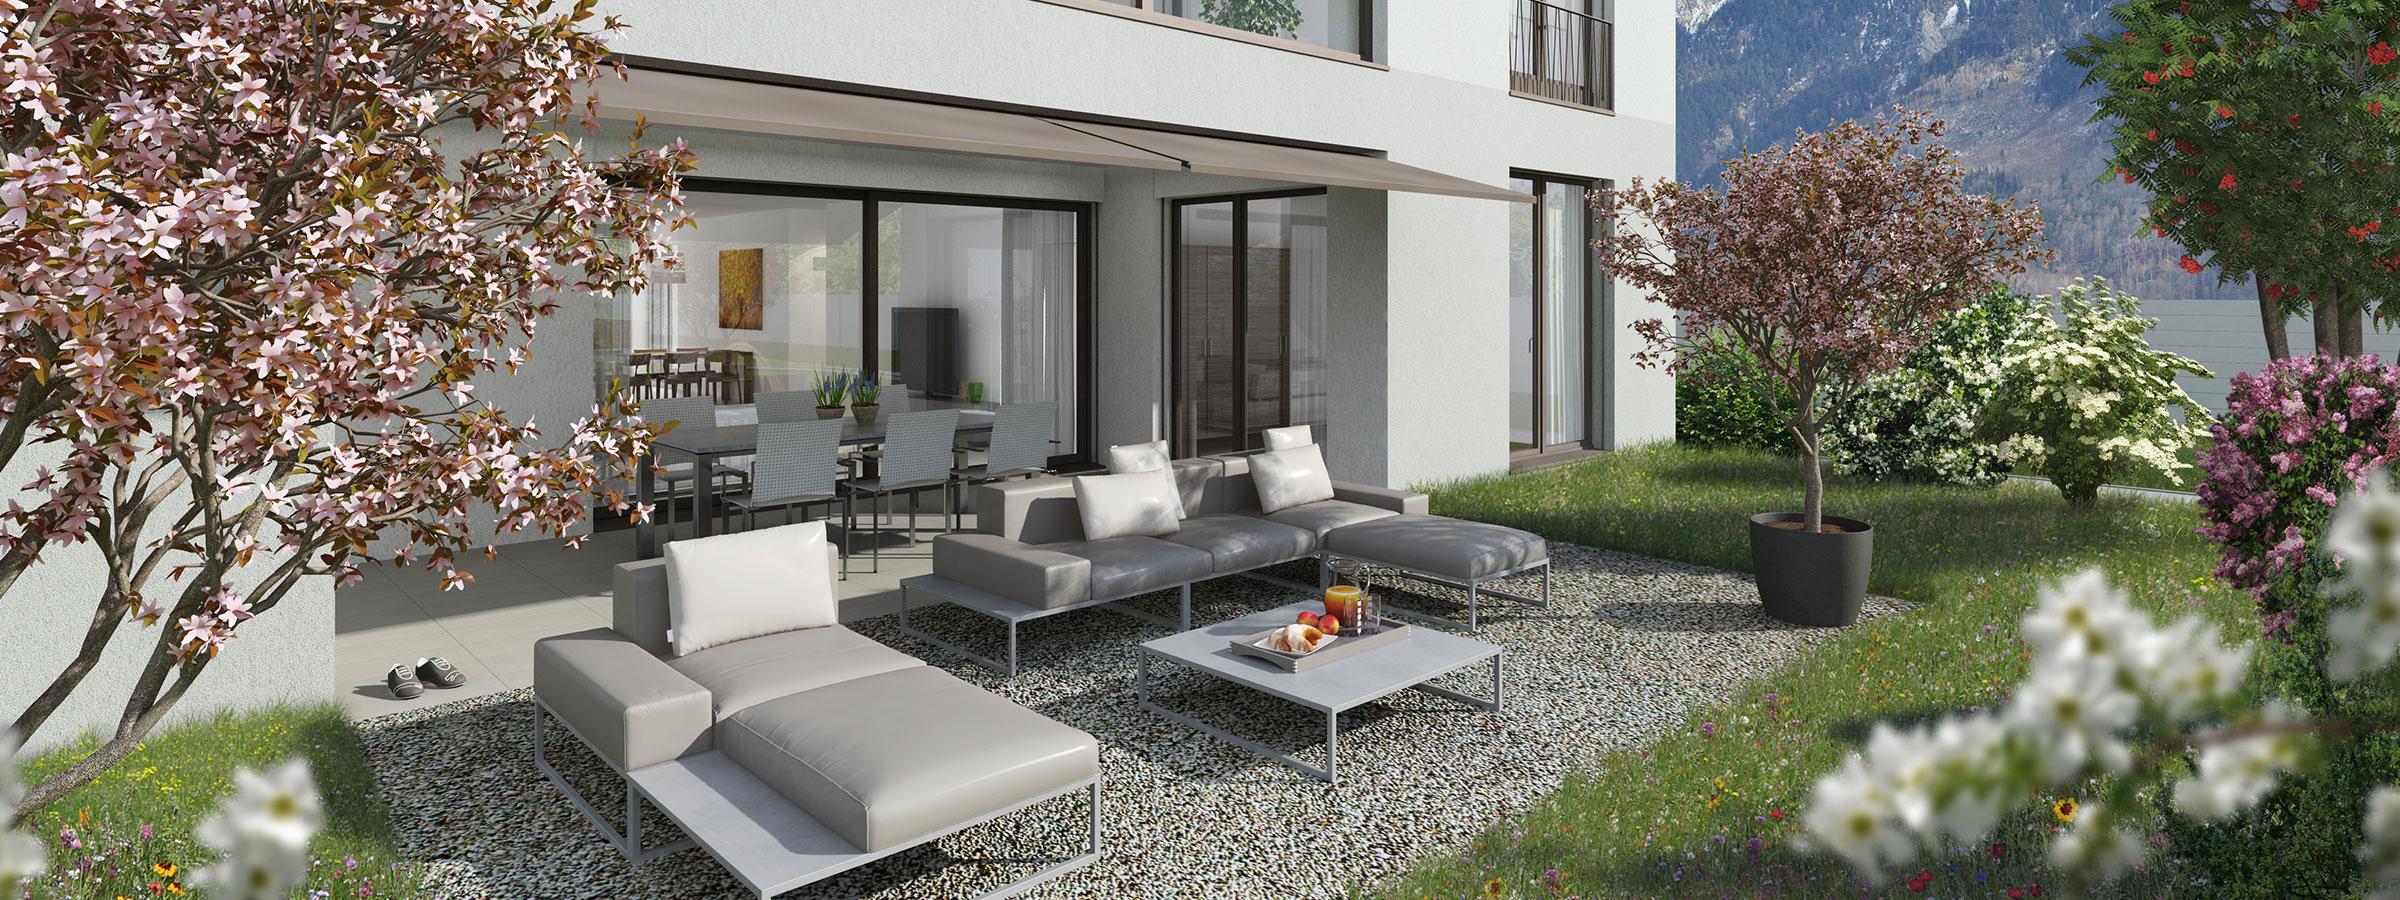 Haus-B-Sitzplatz-fin_2400px